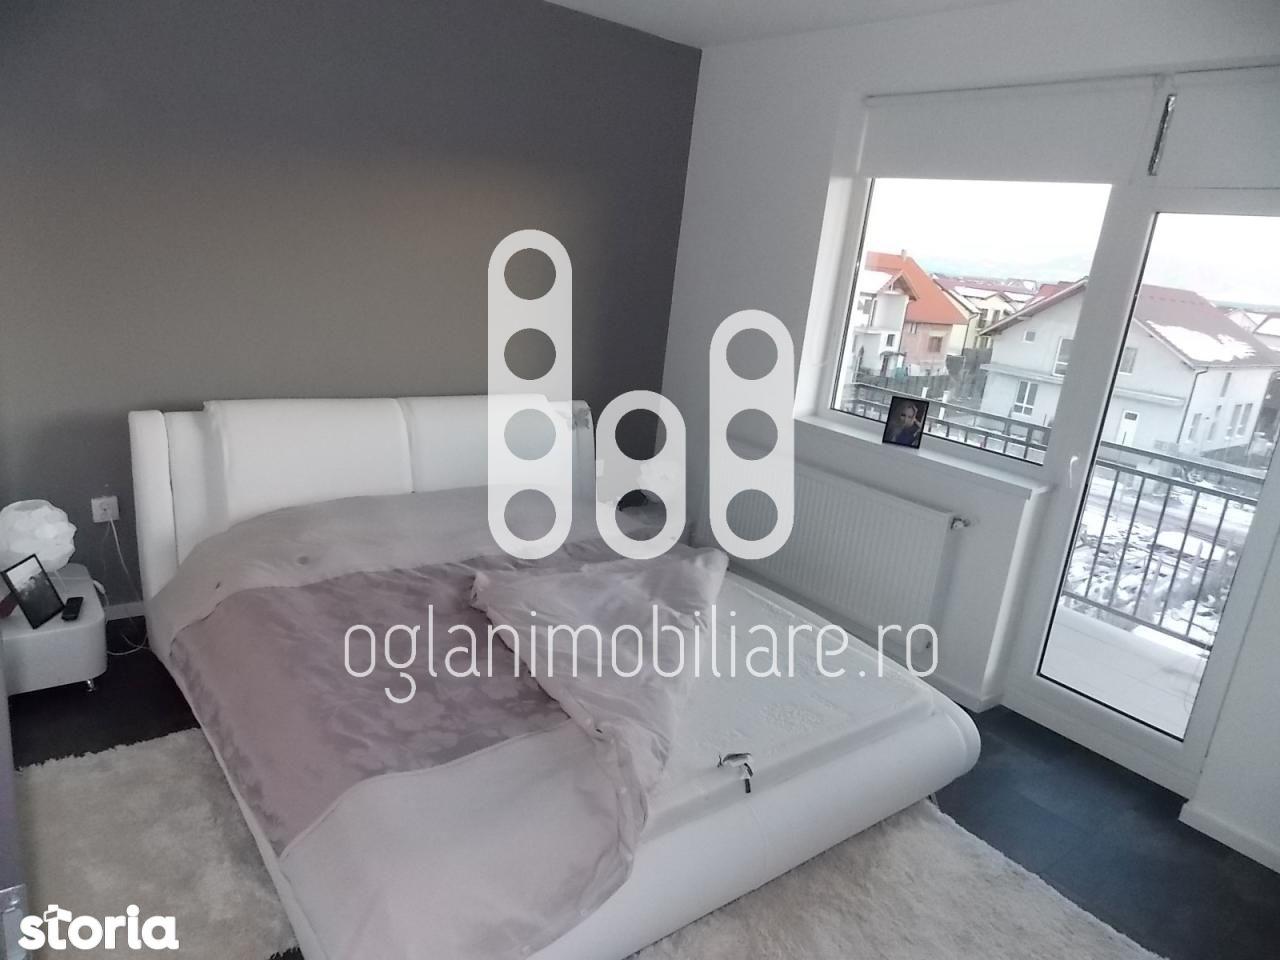 Apartament de vanzare, Sibiu (judet), Şelimbăr - Foto 1